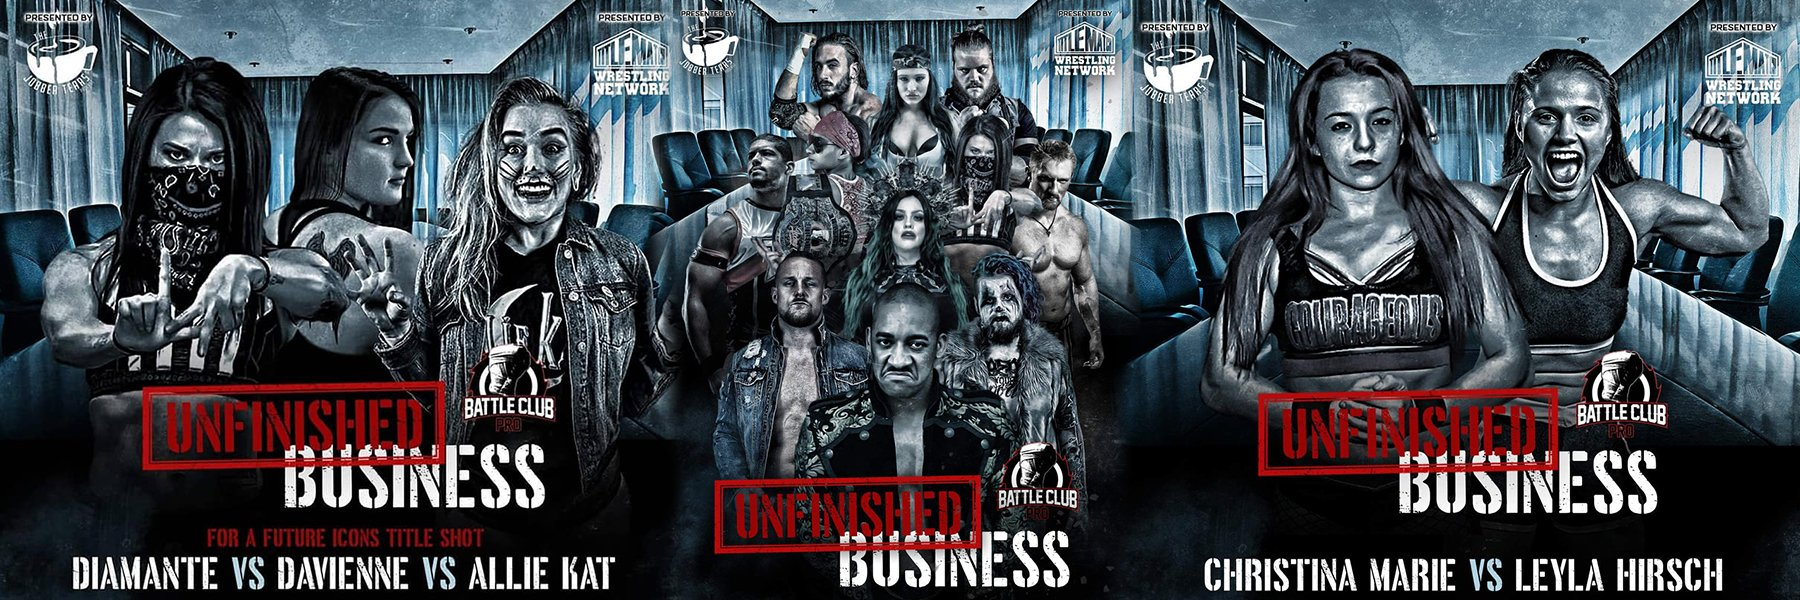 NEW Battle Club Pro! Feat Anthony Bowens, Tasha Steelz, Diamante, JT Dunn